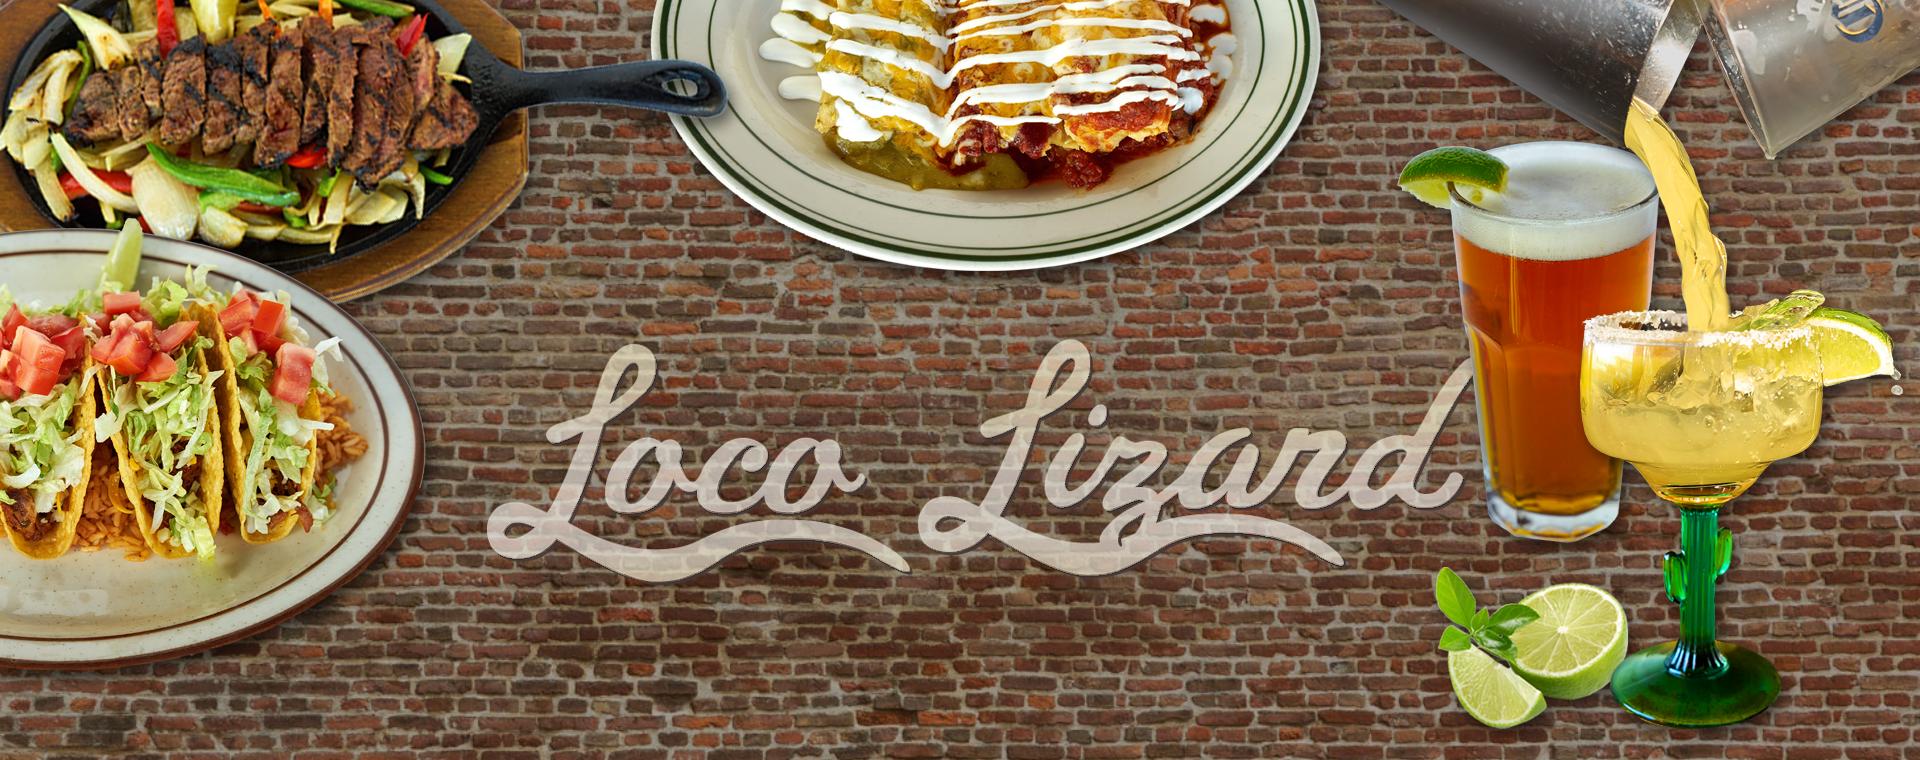 Loco Lizard Cantina – Park City Mexican Food